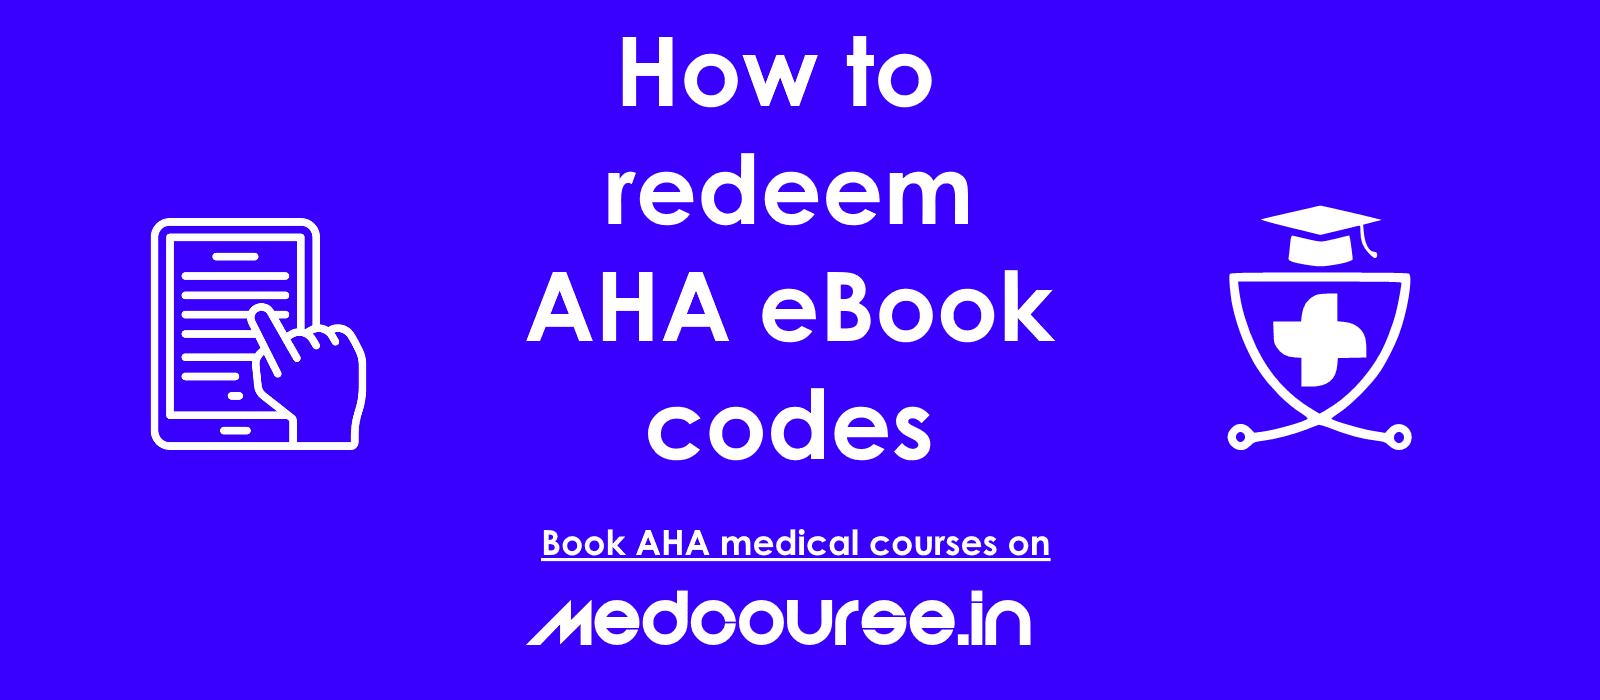 How to redeem AHA ebook